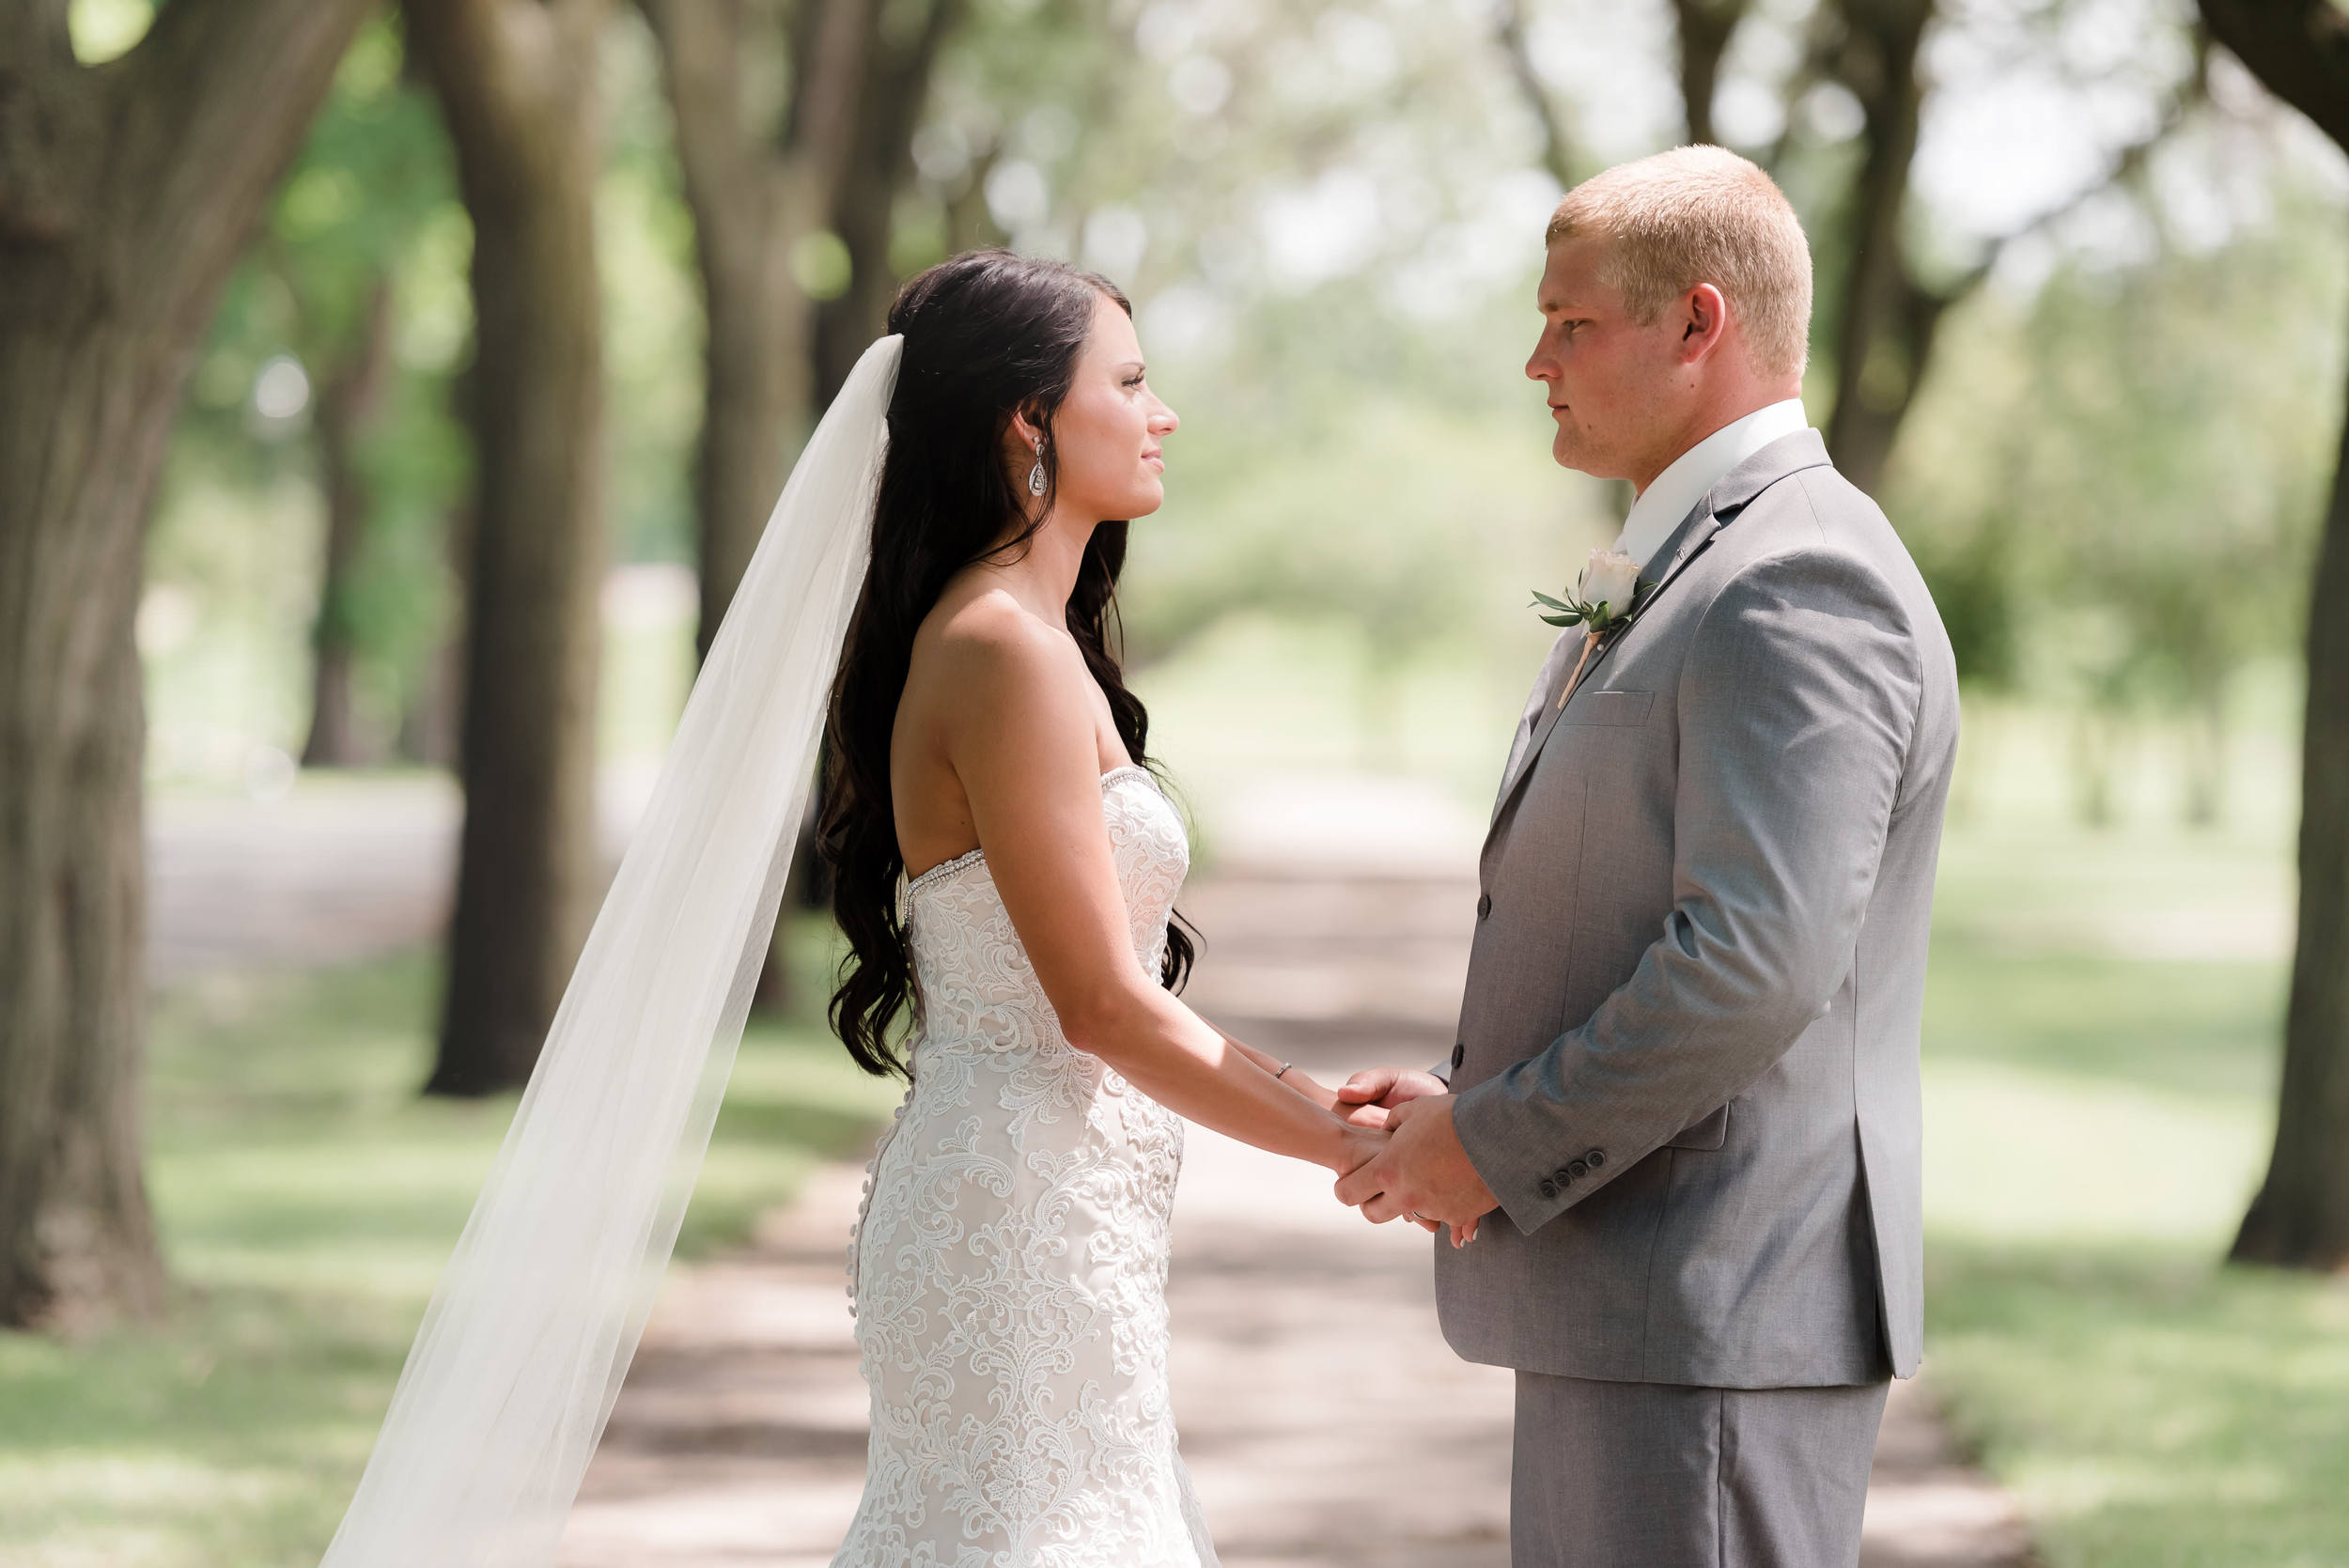 Layce and Brandon - Wedding - Outdoor Portraits-70.jpg